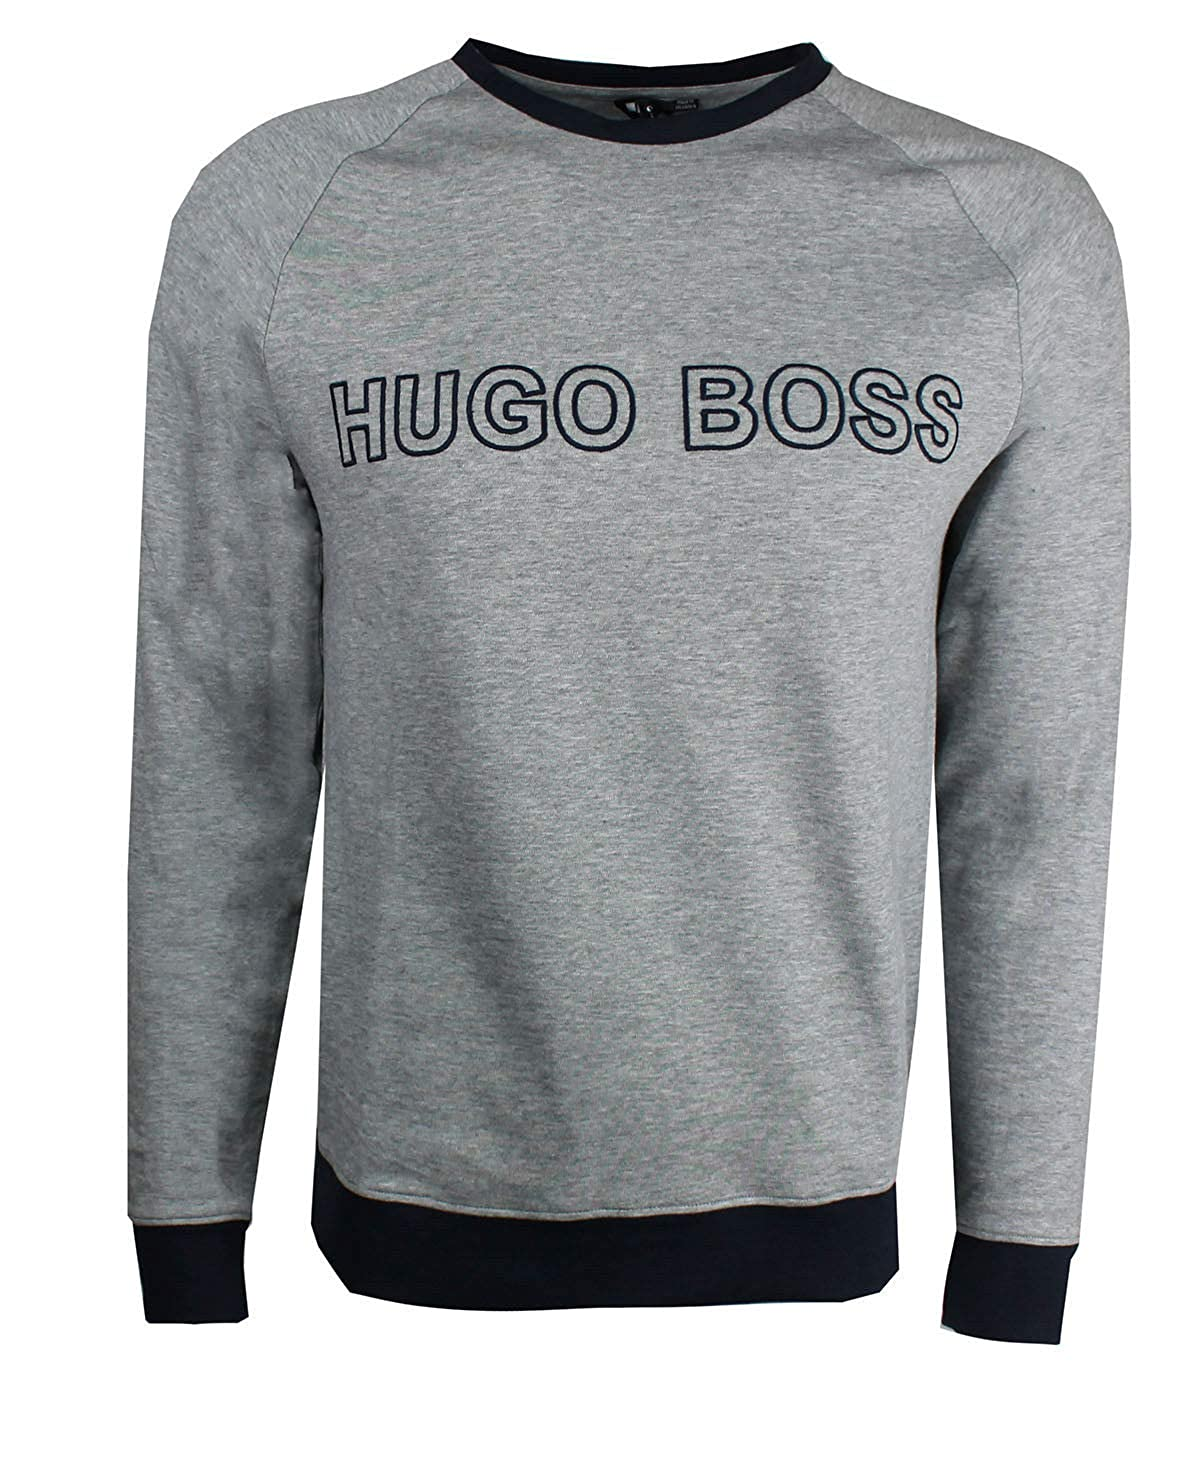 Hugo Boss Mens Sweatshirt Contemp Sweatshirt 50388331 033